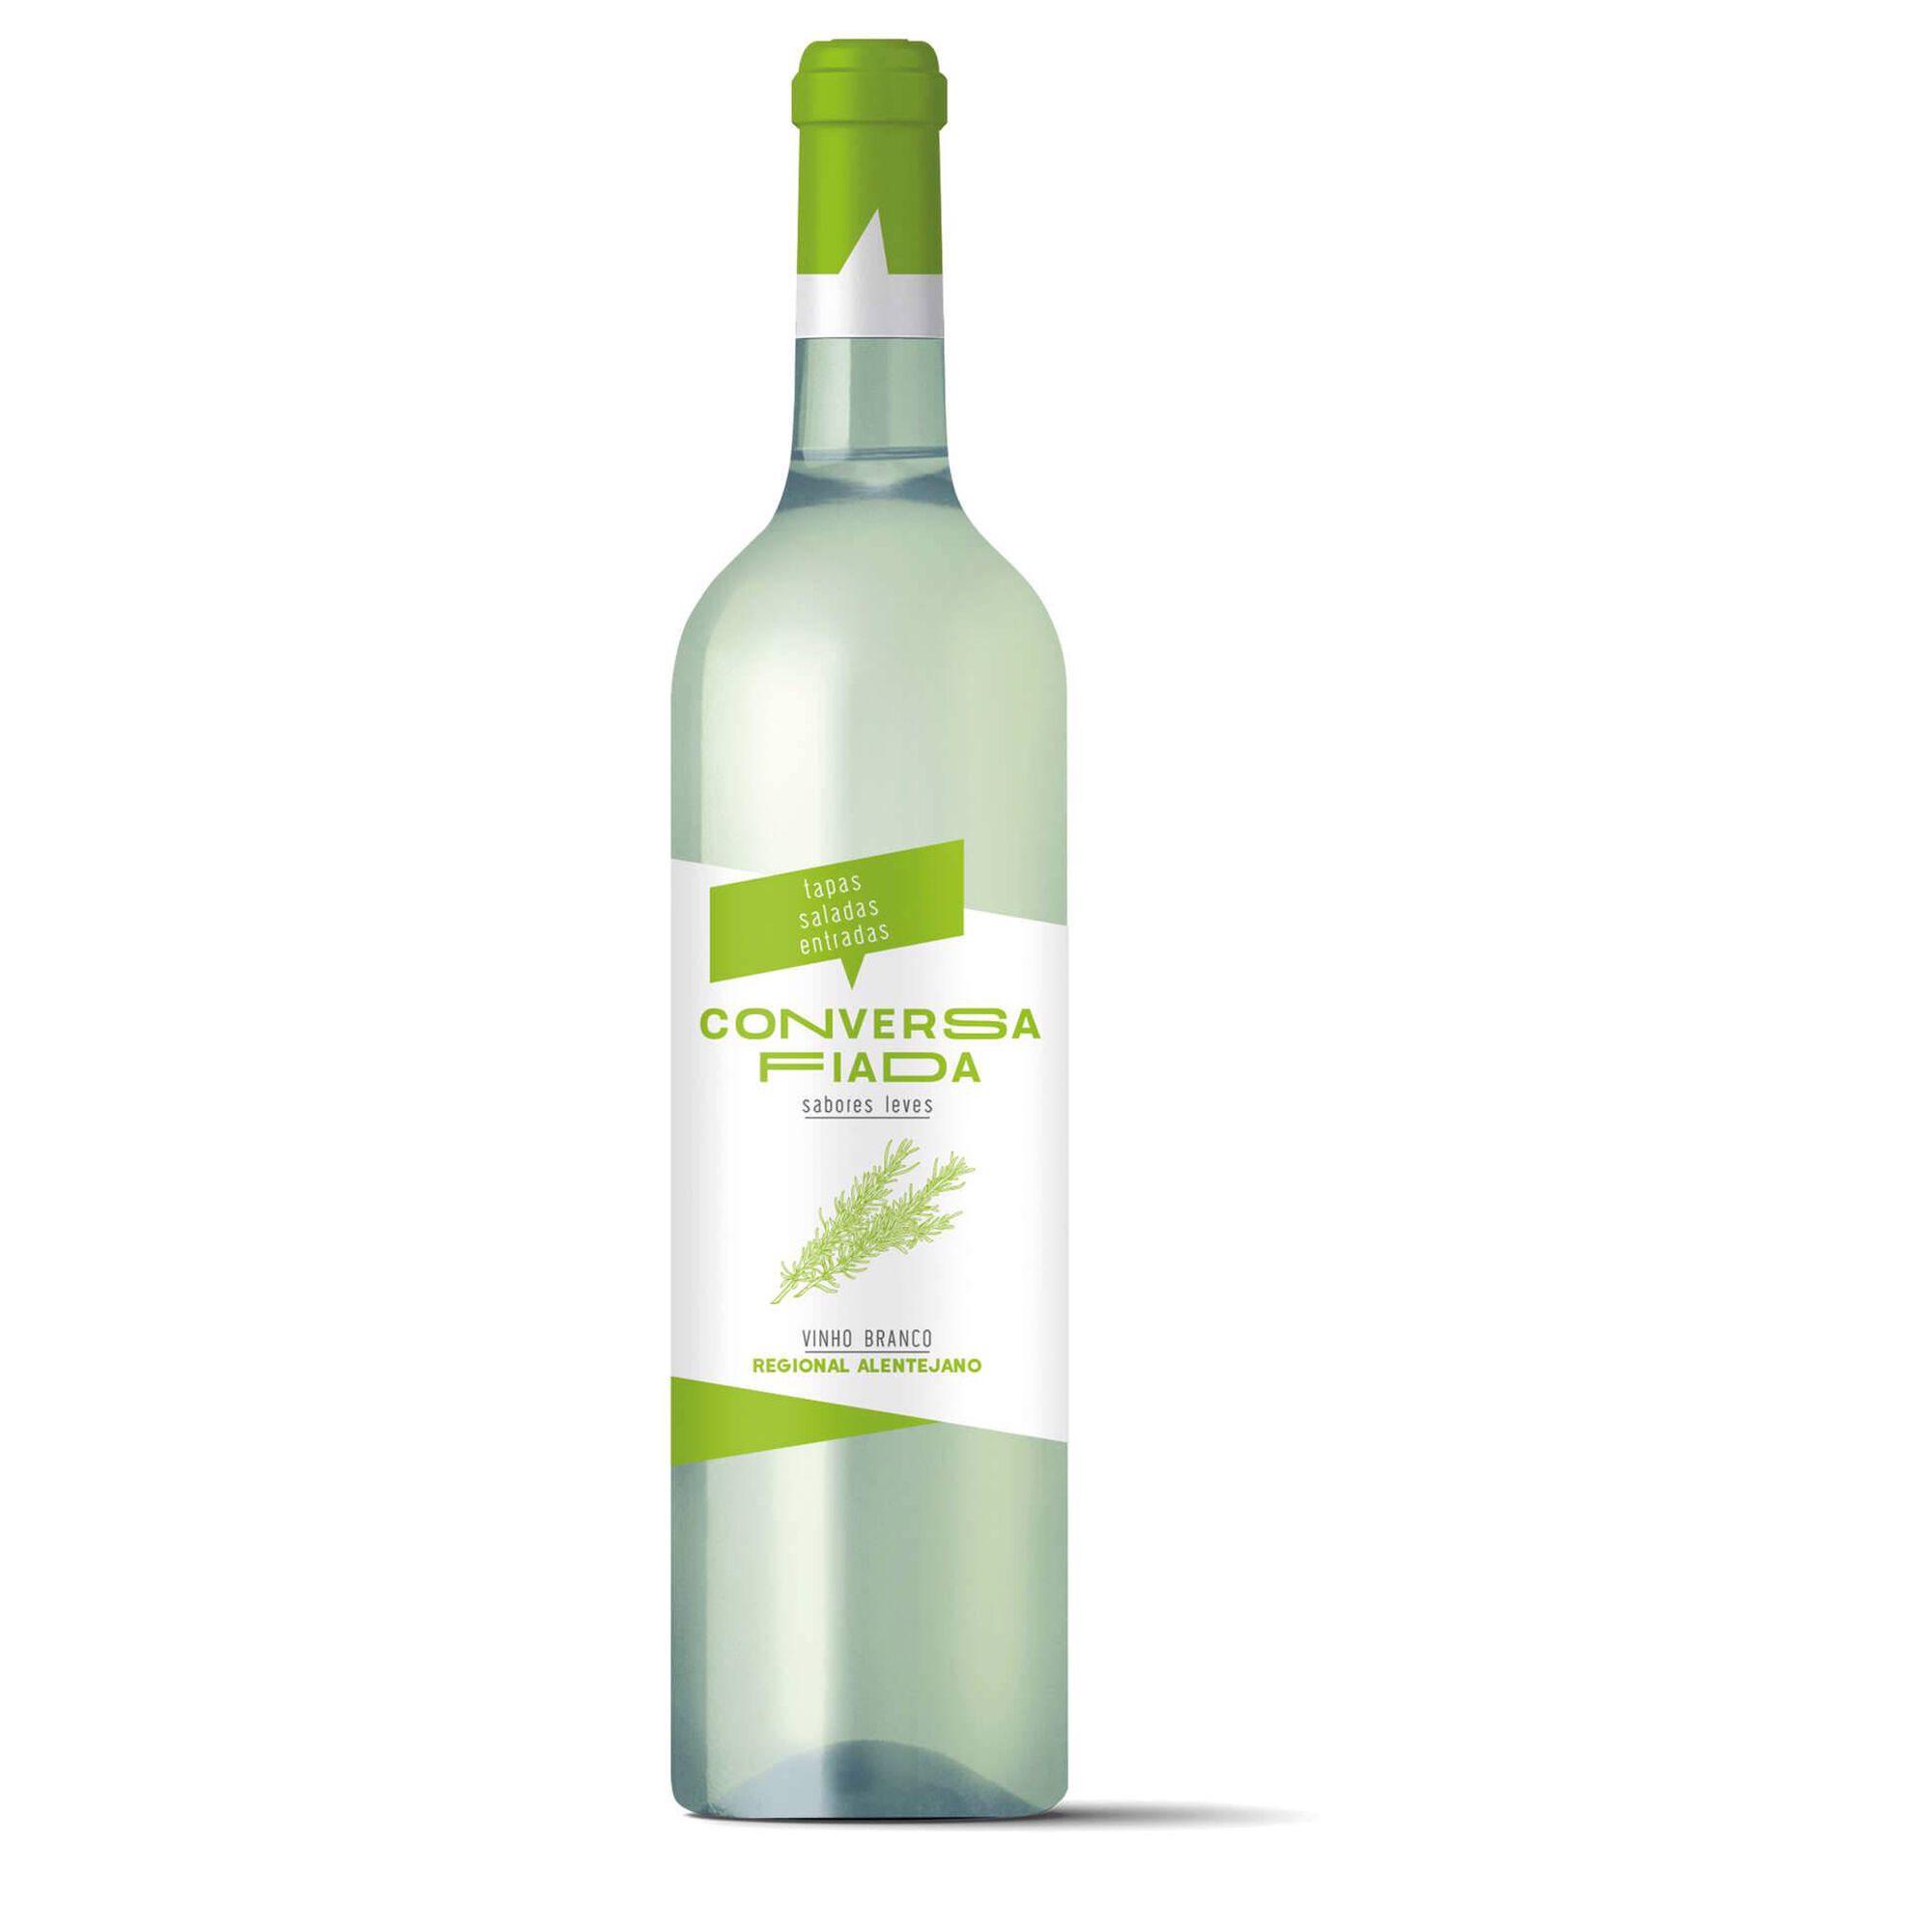 Conversa Fiada Regional Alentejano Vinho Branco